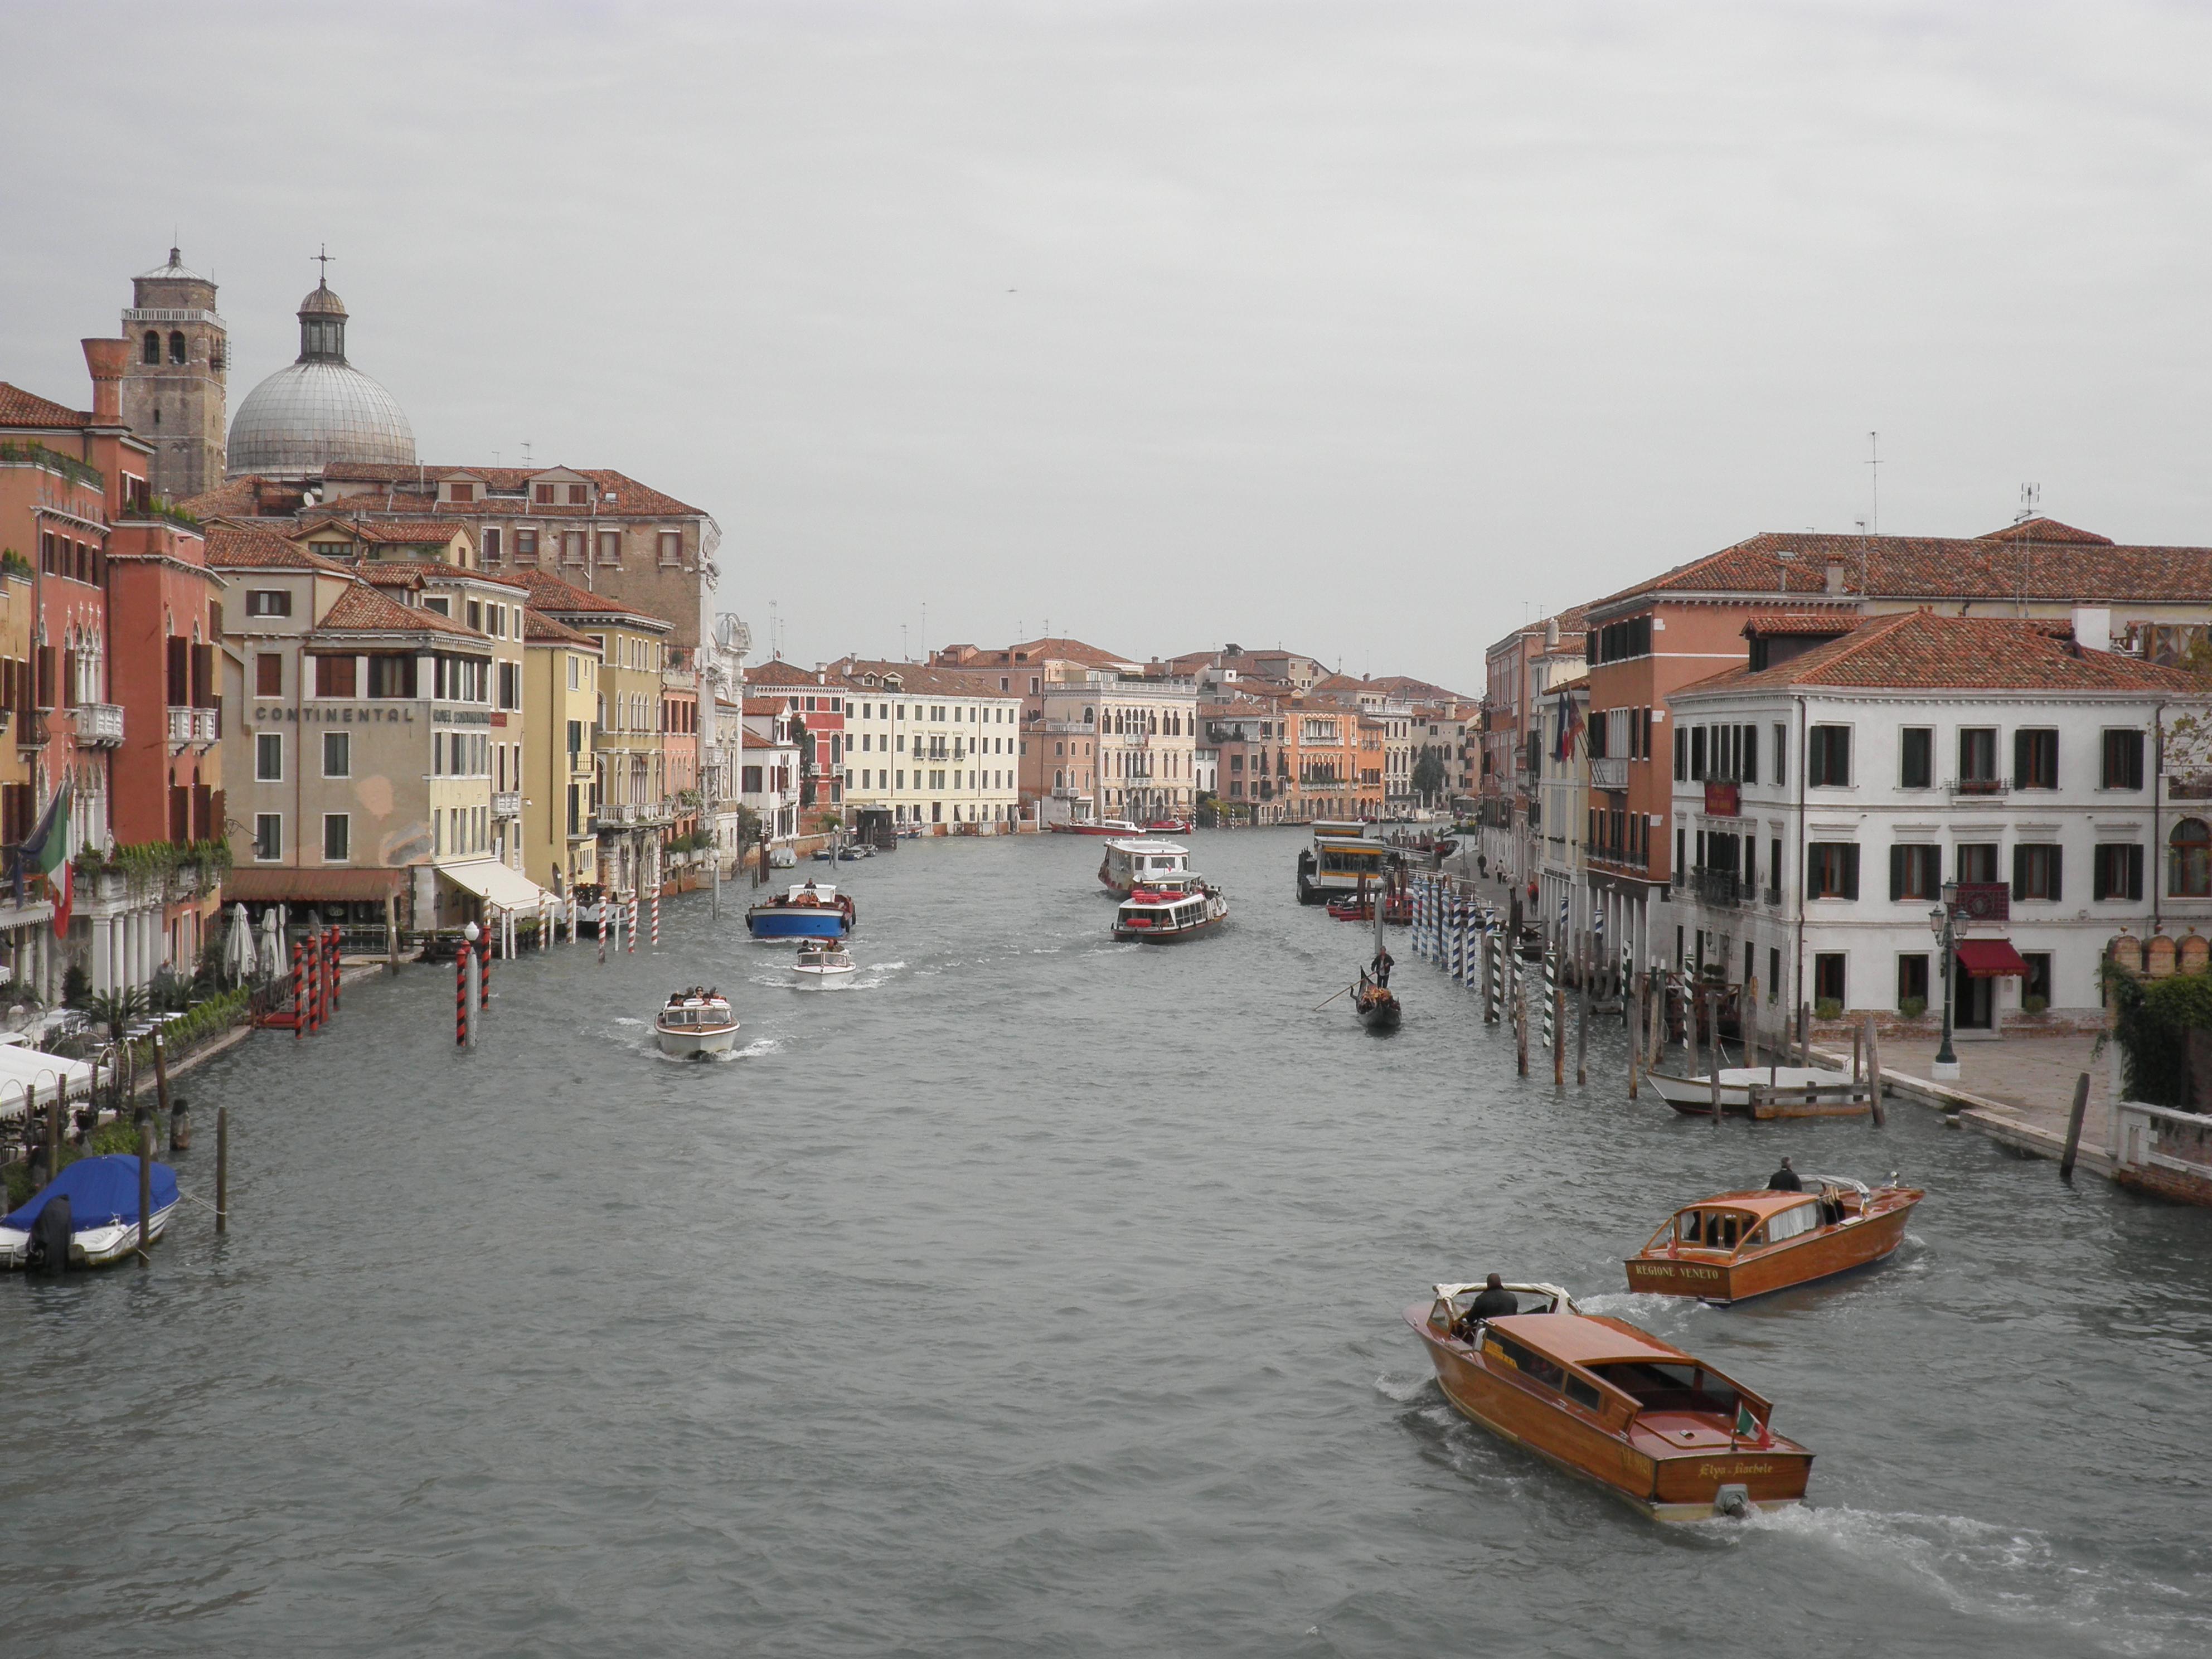 Venice Canale Grande, Canale, Canals, Grande, Italy, HQ Photo